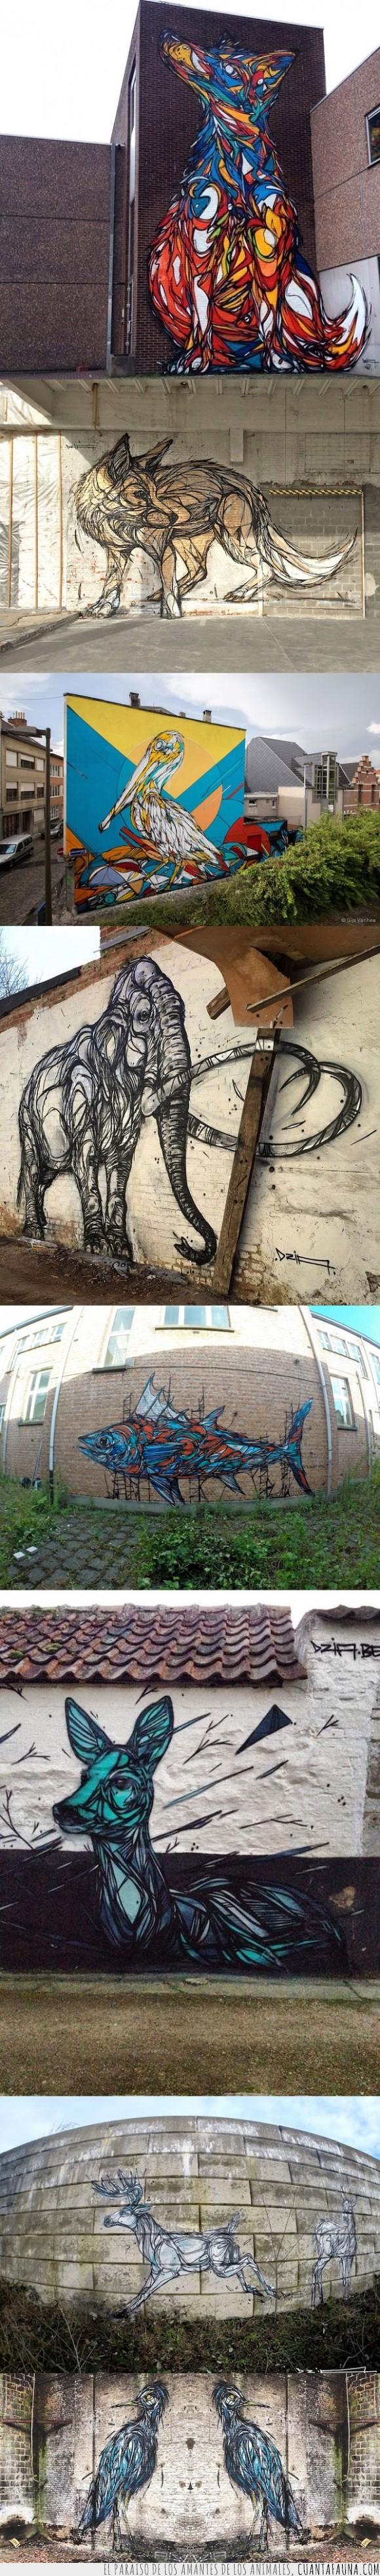 animal,arte,ave,ciervo,ciudad,Dzia,geometria,graffitero,graffiti,ilustracion,naturaleza,urbano